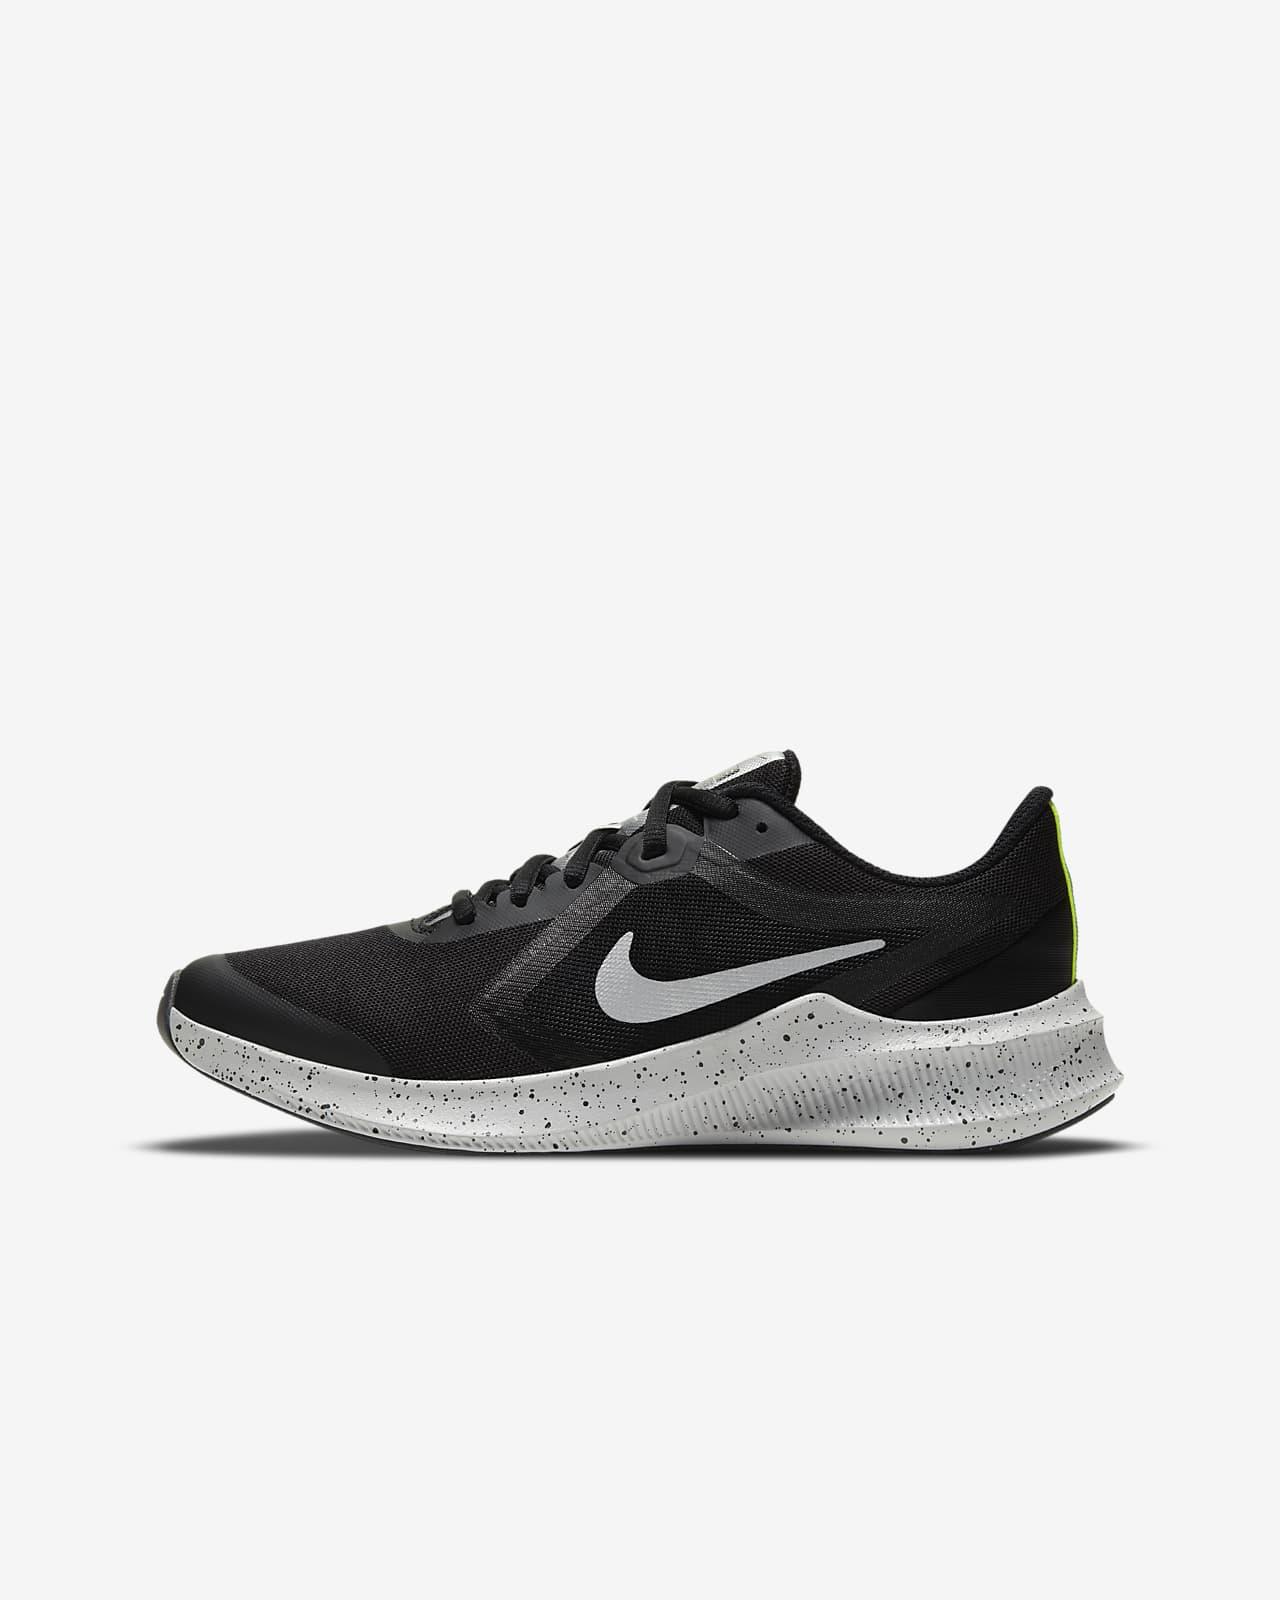 Nike Downshifter 10 VIZ Older Kids' Running Shoe